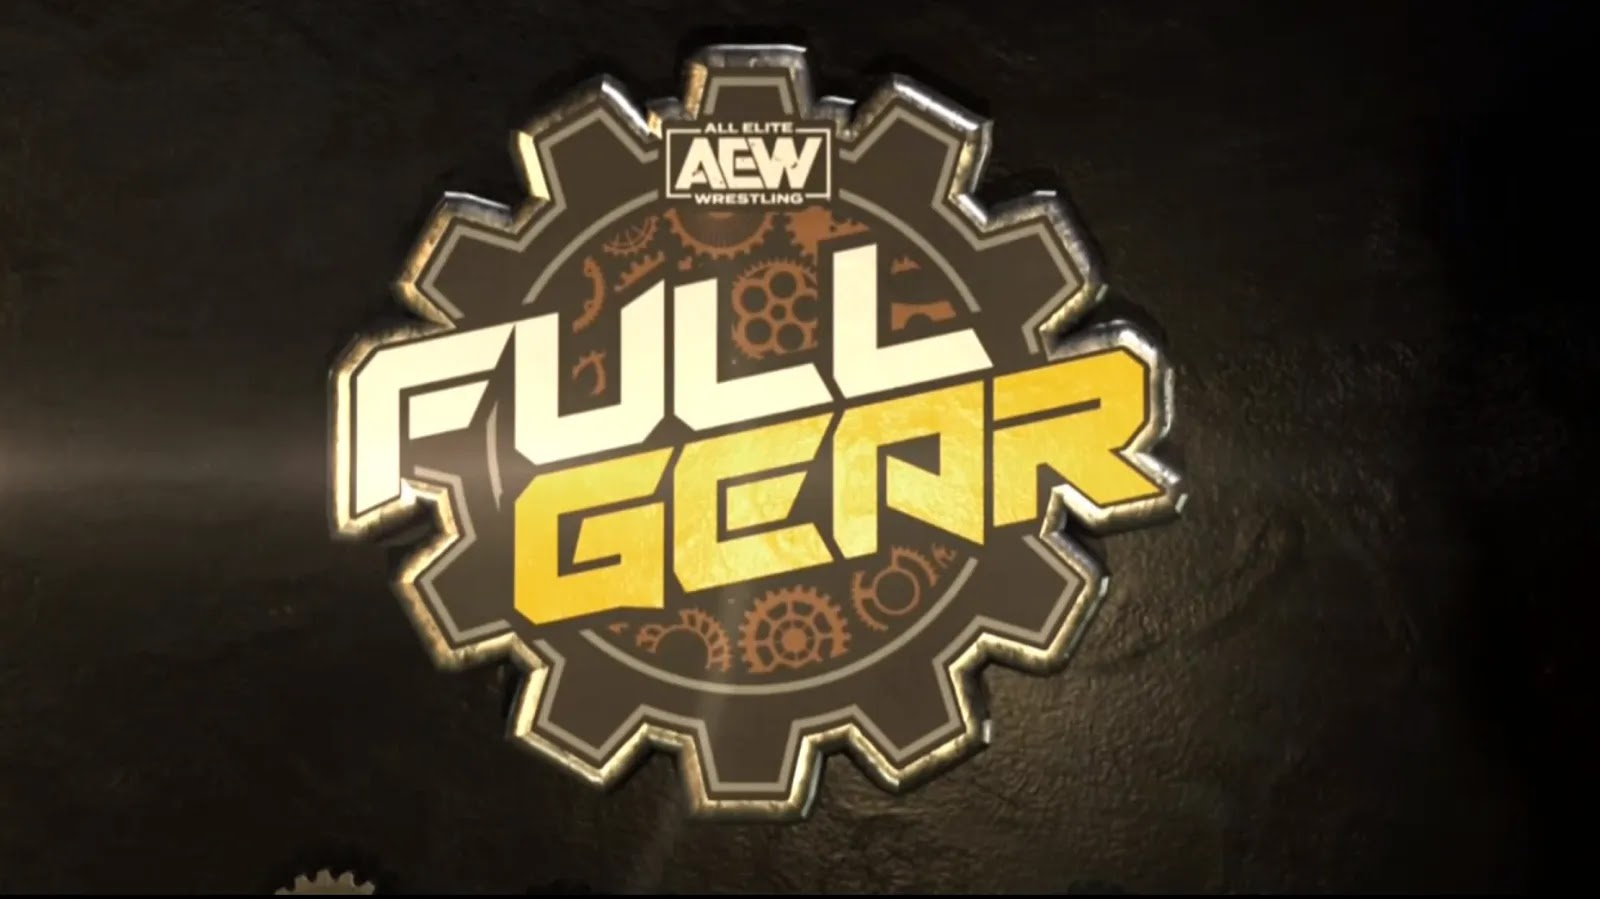 AEW anuncia data e local do pay-per-view Full Gear